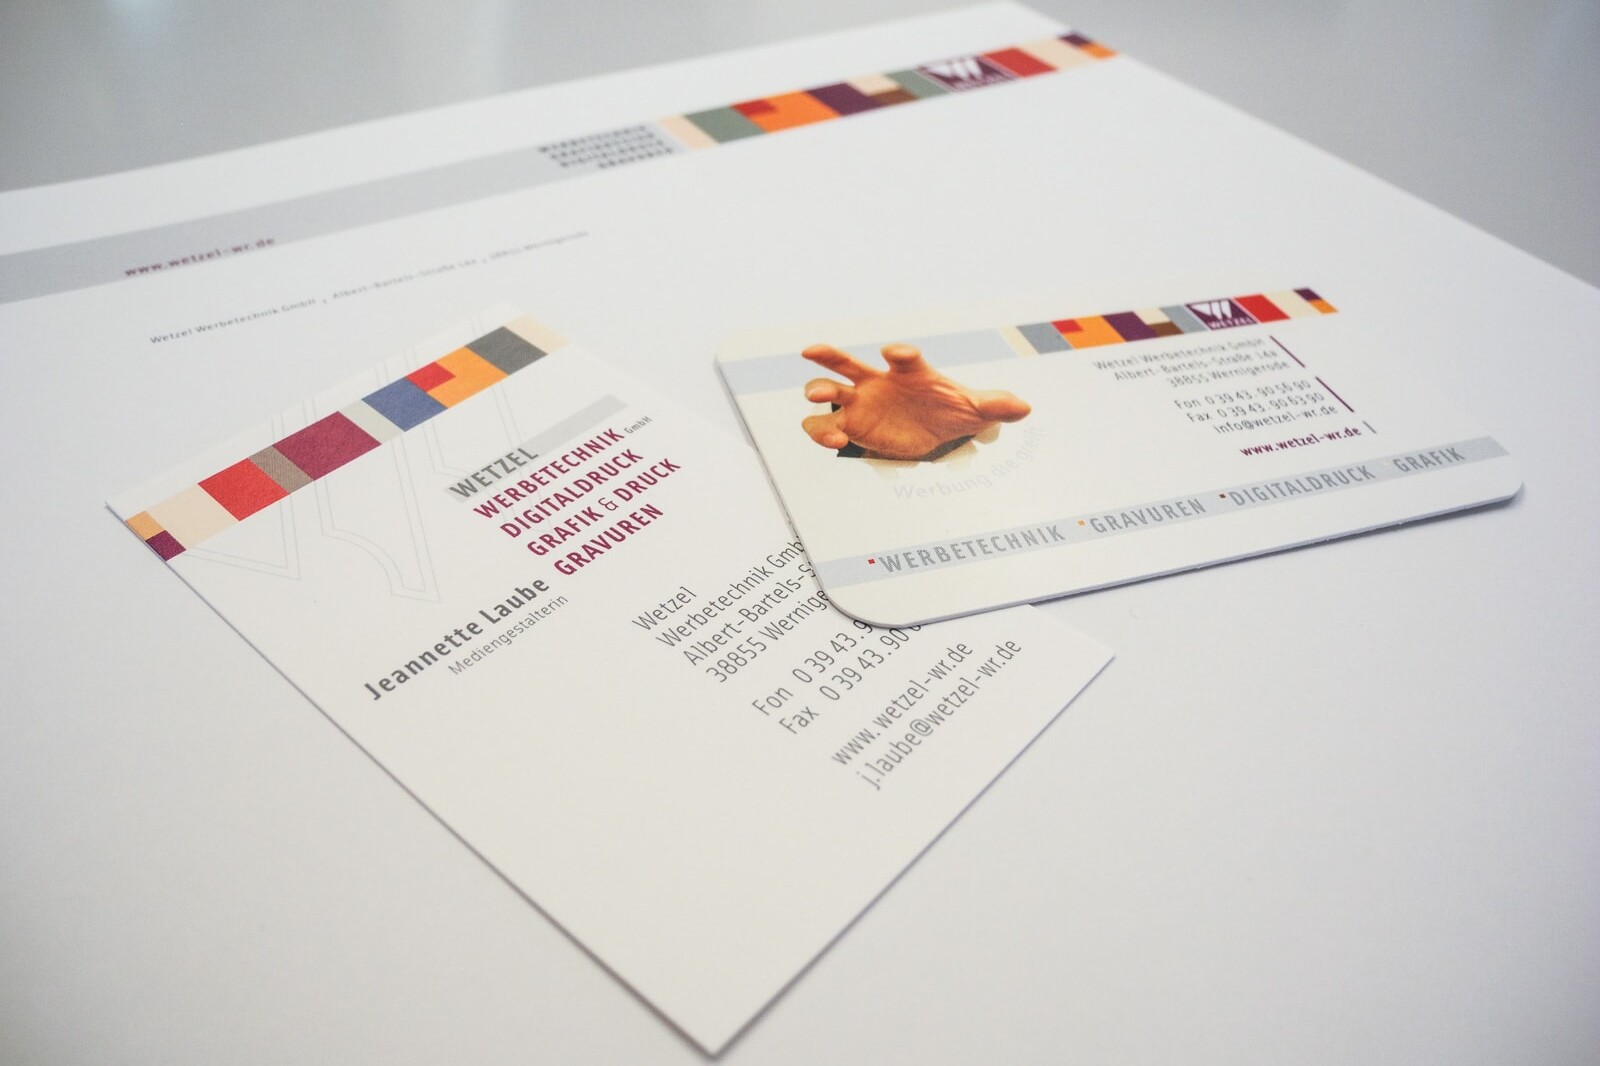 Briefbogengestaltung